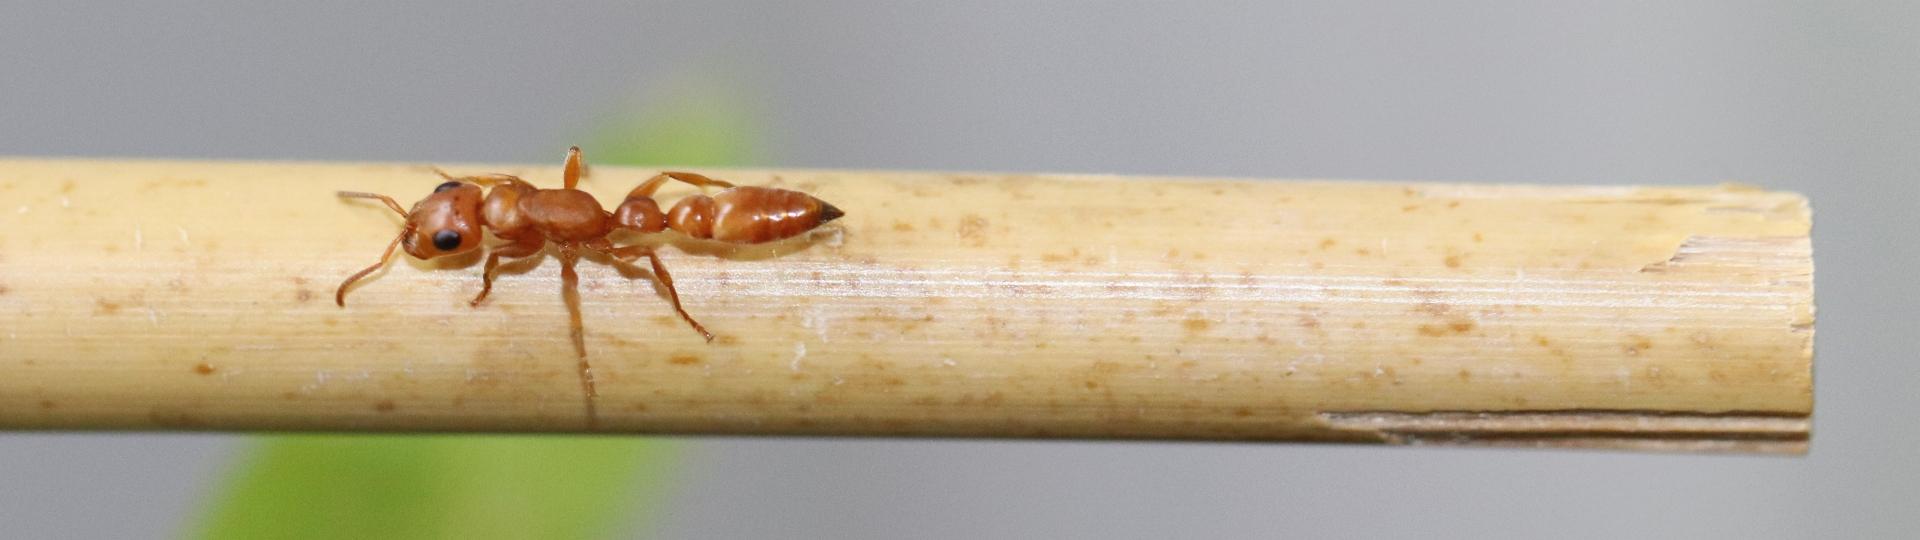 Tetraponera schulthessi 02 Arbeiterin auf Bambus 02